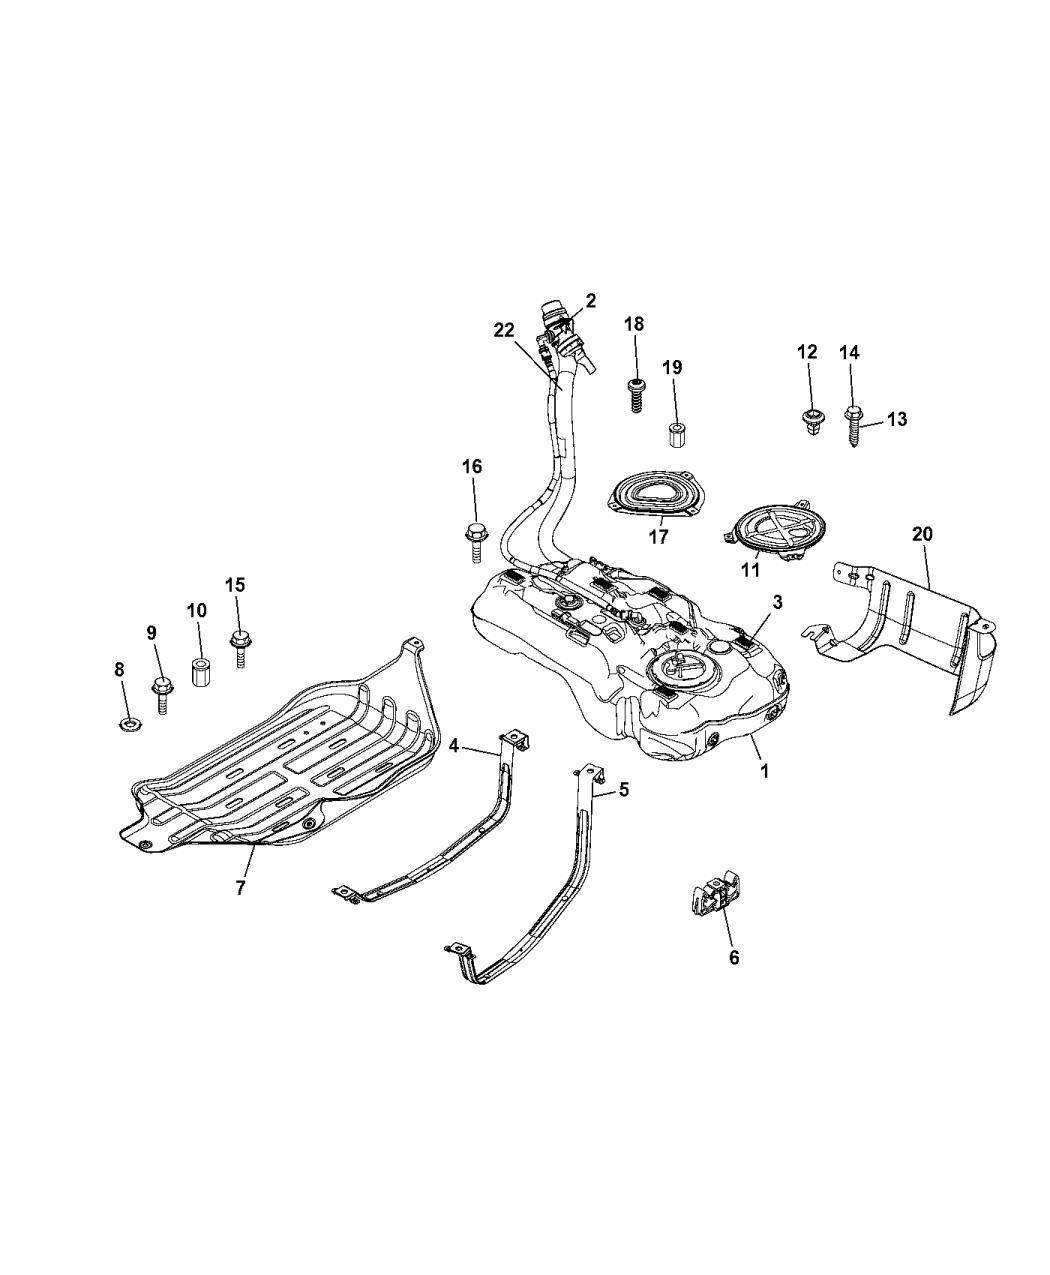 68372070AA - Genuine Mopar TUBE-FUEL FILLER